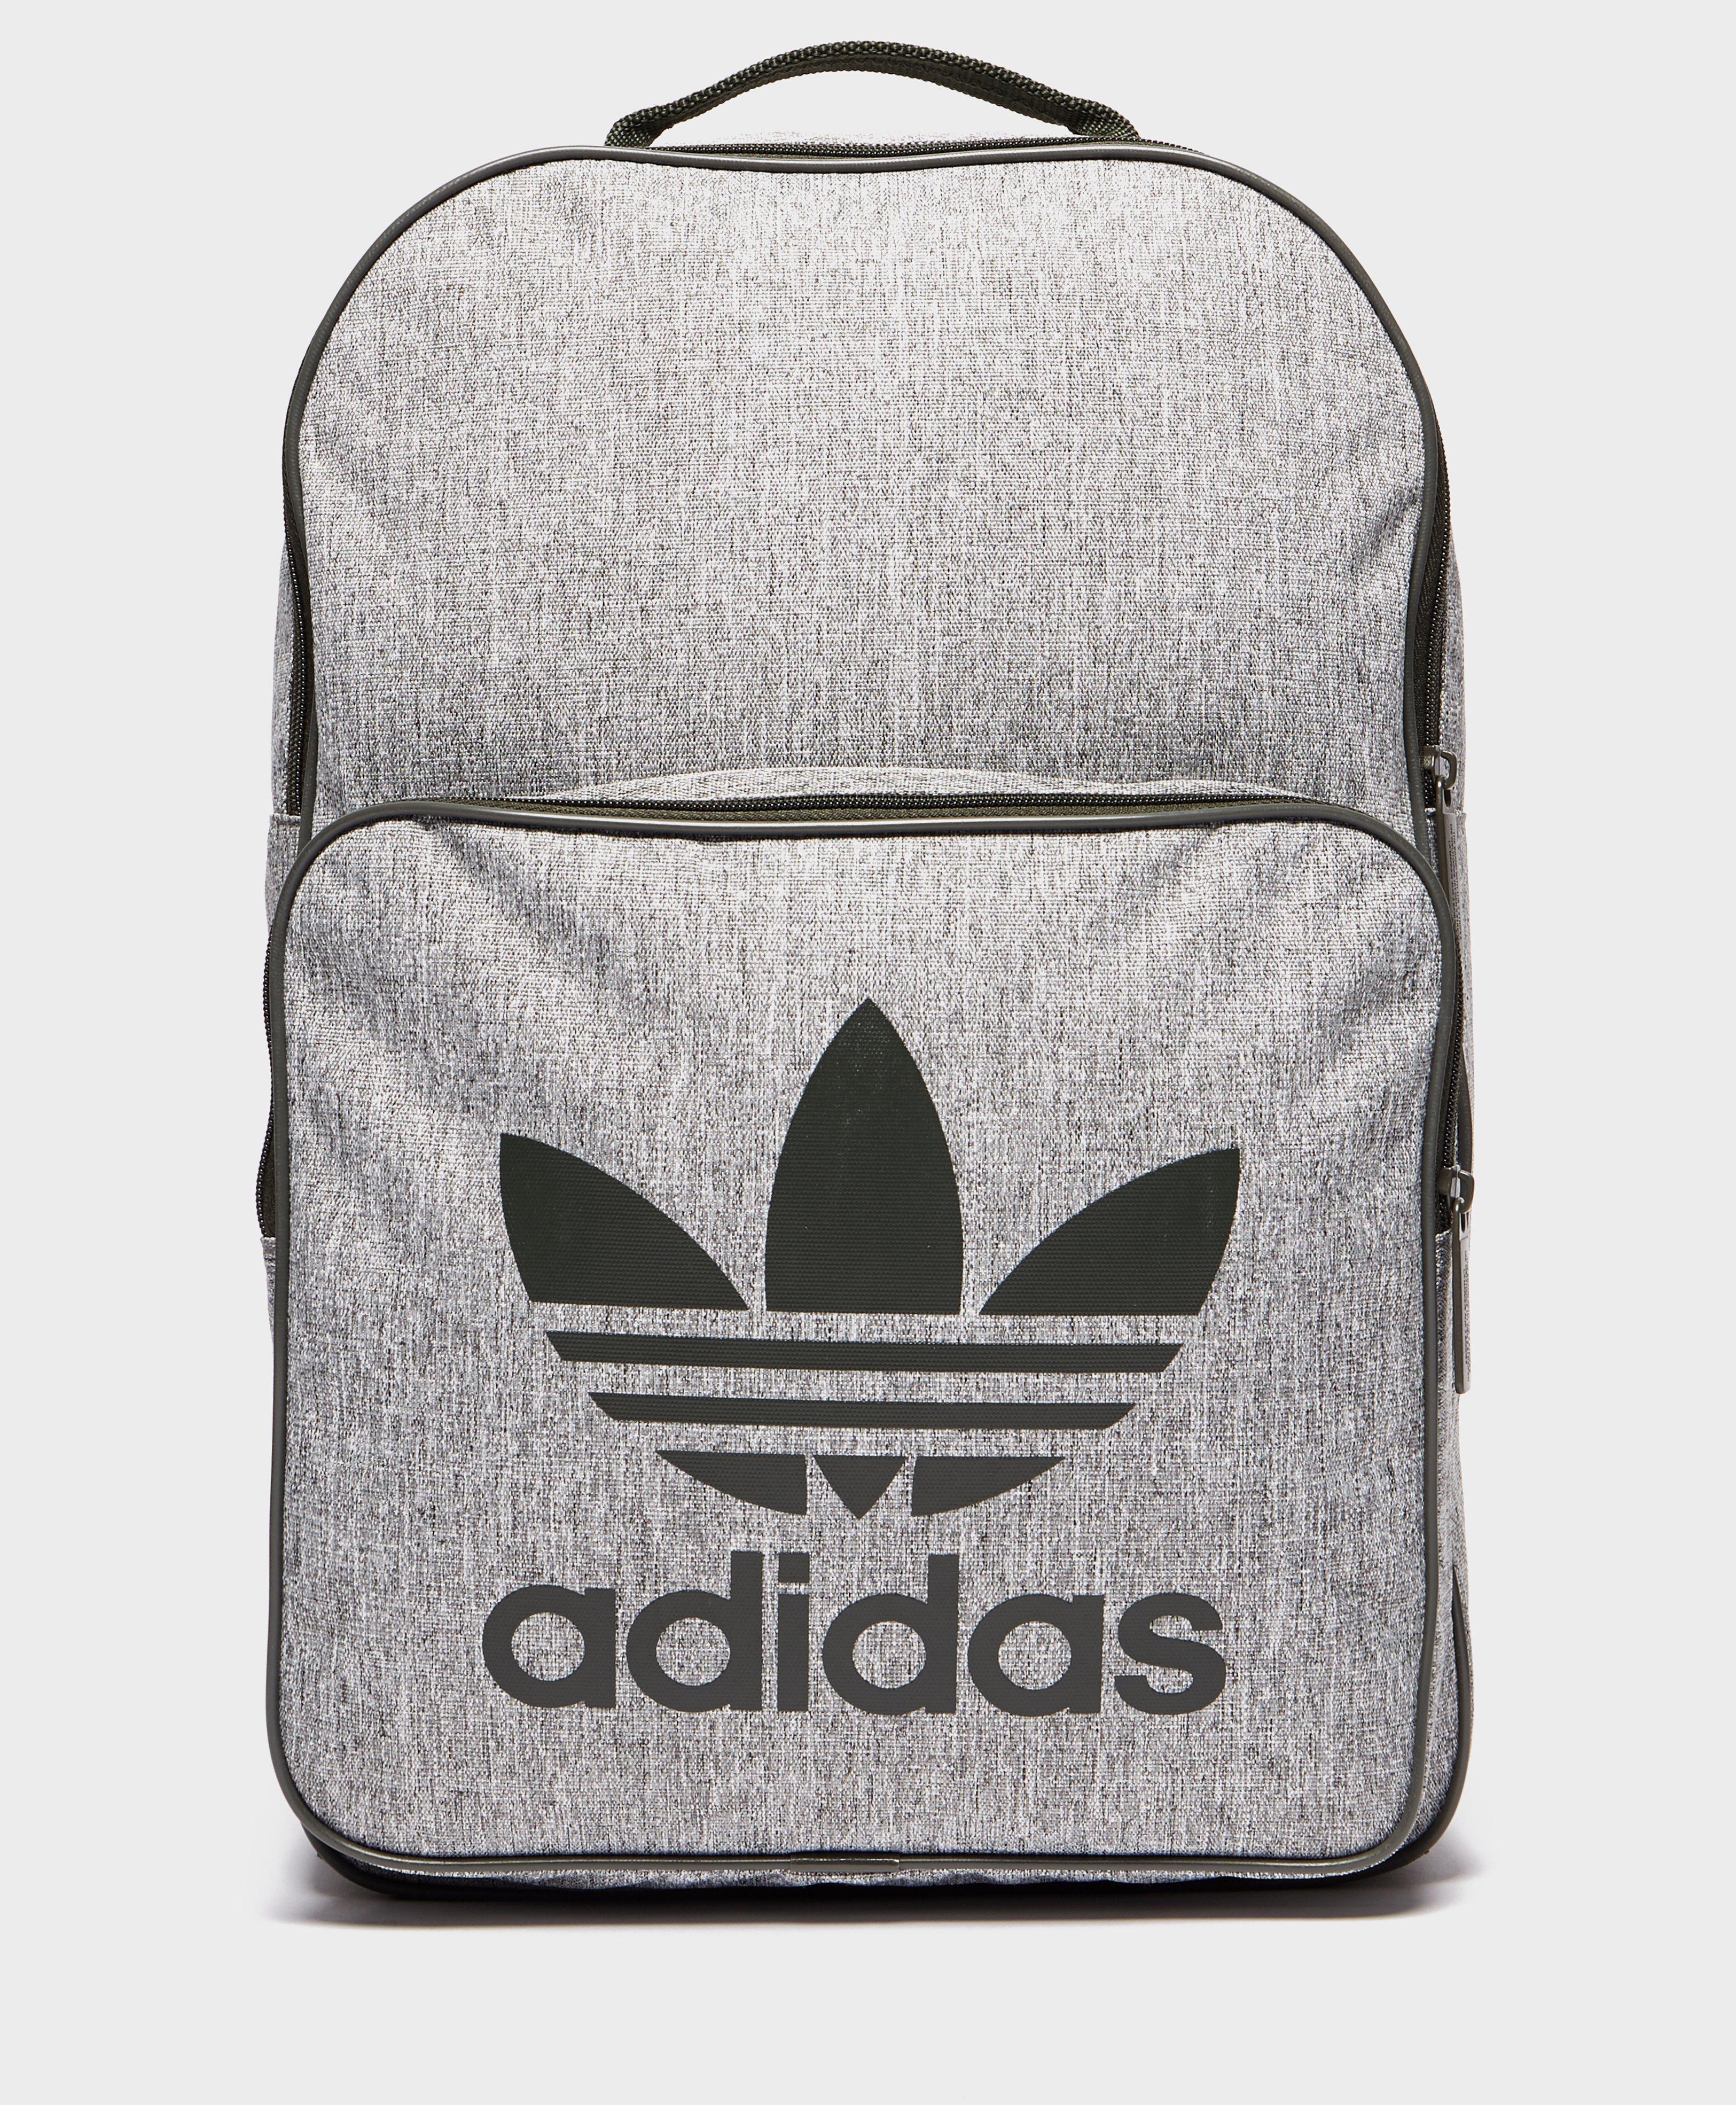 Adidas Originals Trefoil Backpack Burgundy- Fenix Toulouse Handball 9f1be4a6ca169